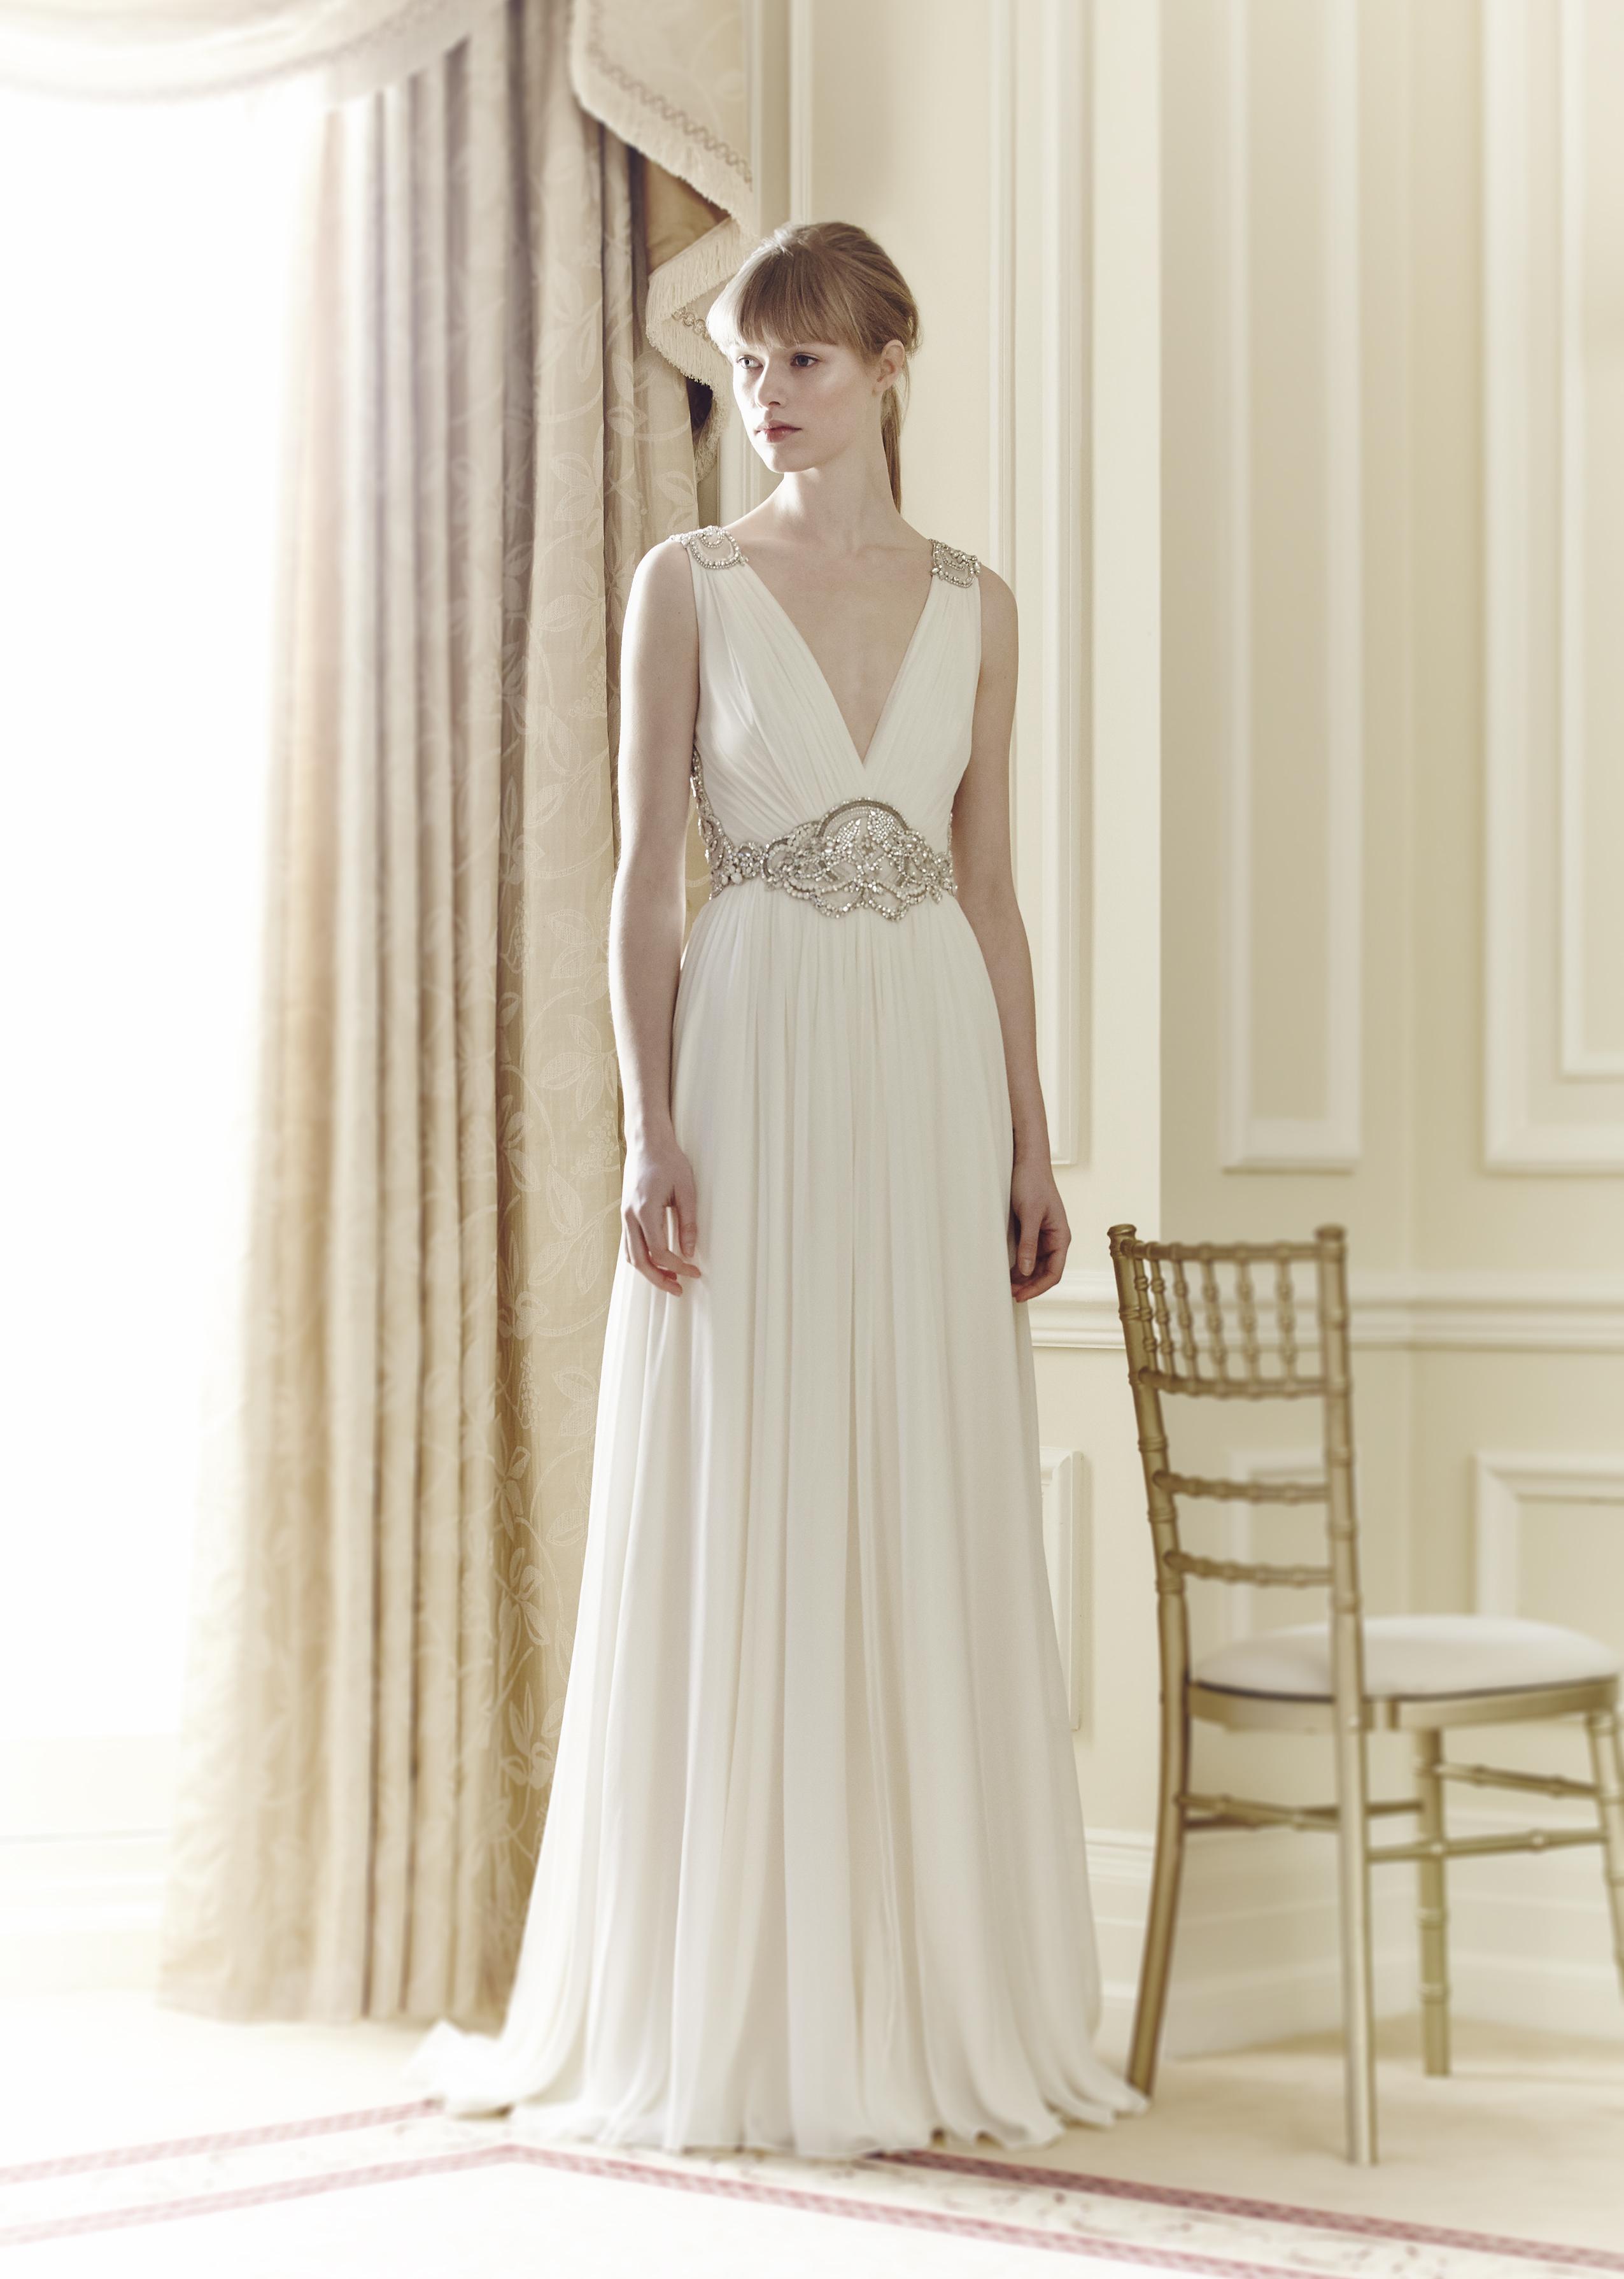 Wedding Dresses, Vintage Wedding Dresses, Hollywood Glam Wedding Dresses, Fashion, Glam Weddings, Vintage Weddings, V-neck Wedding Dresses, Jenny packham, Art Deco Weddings